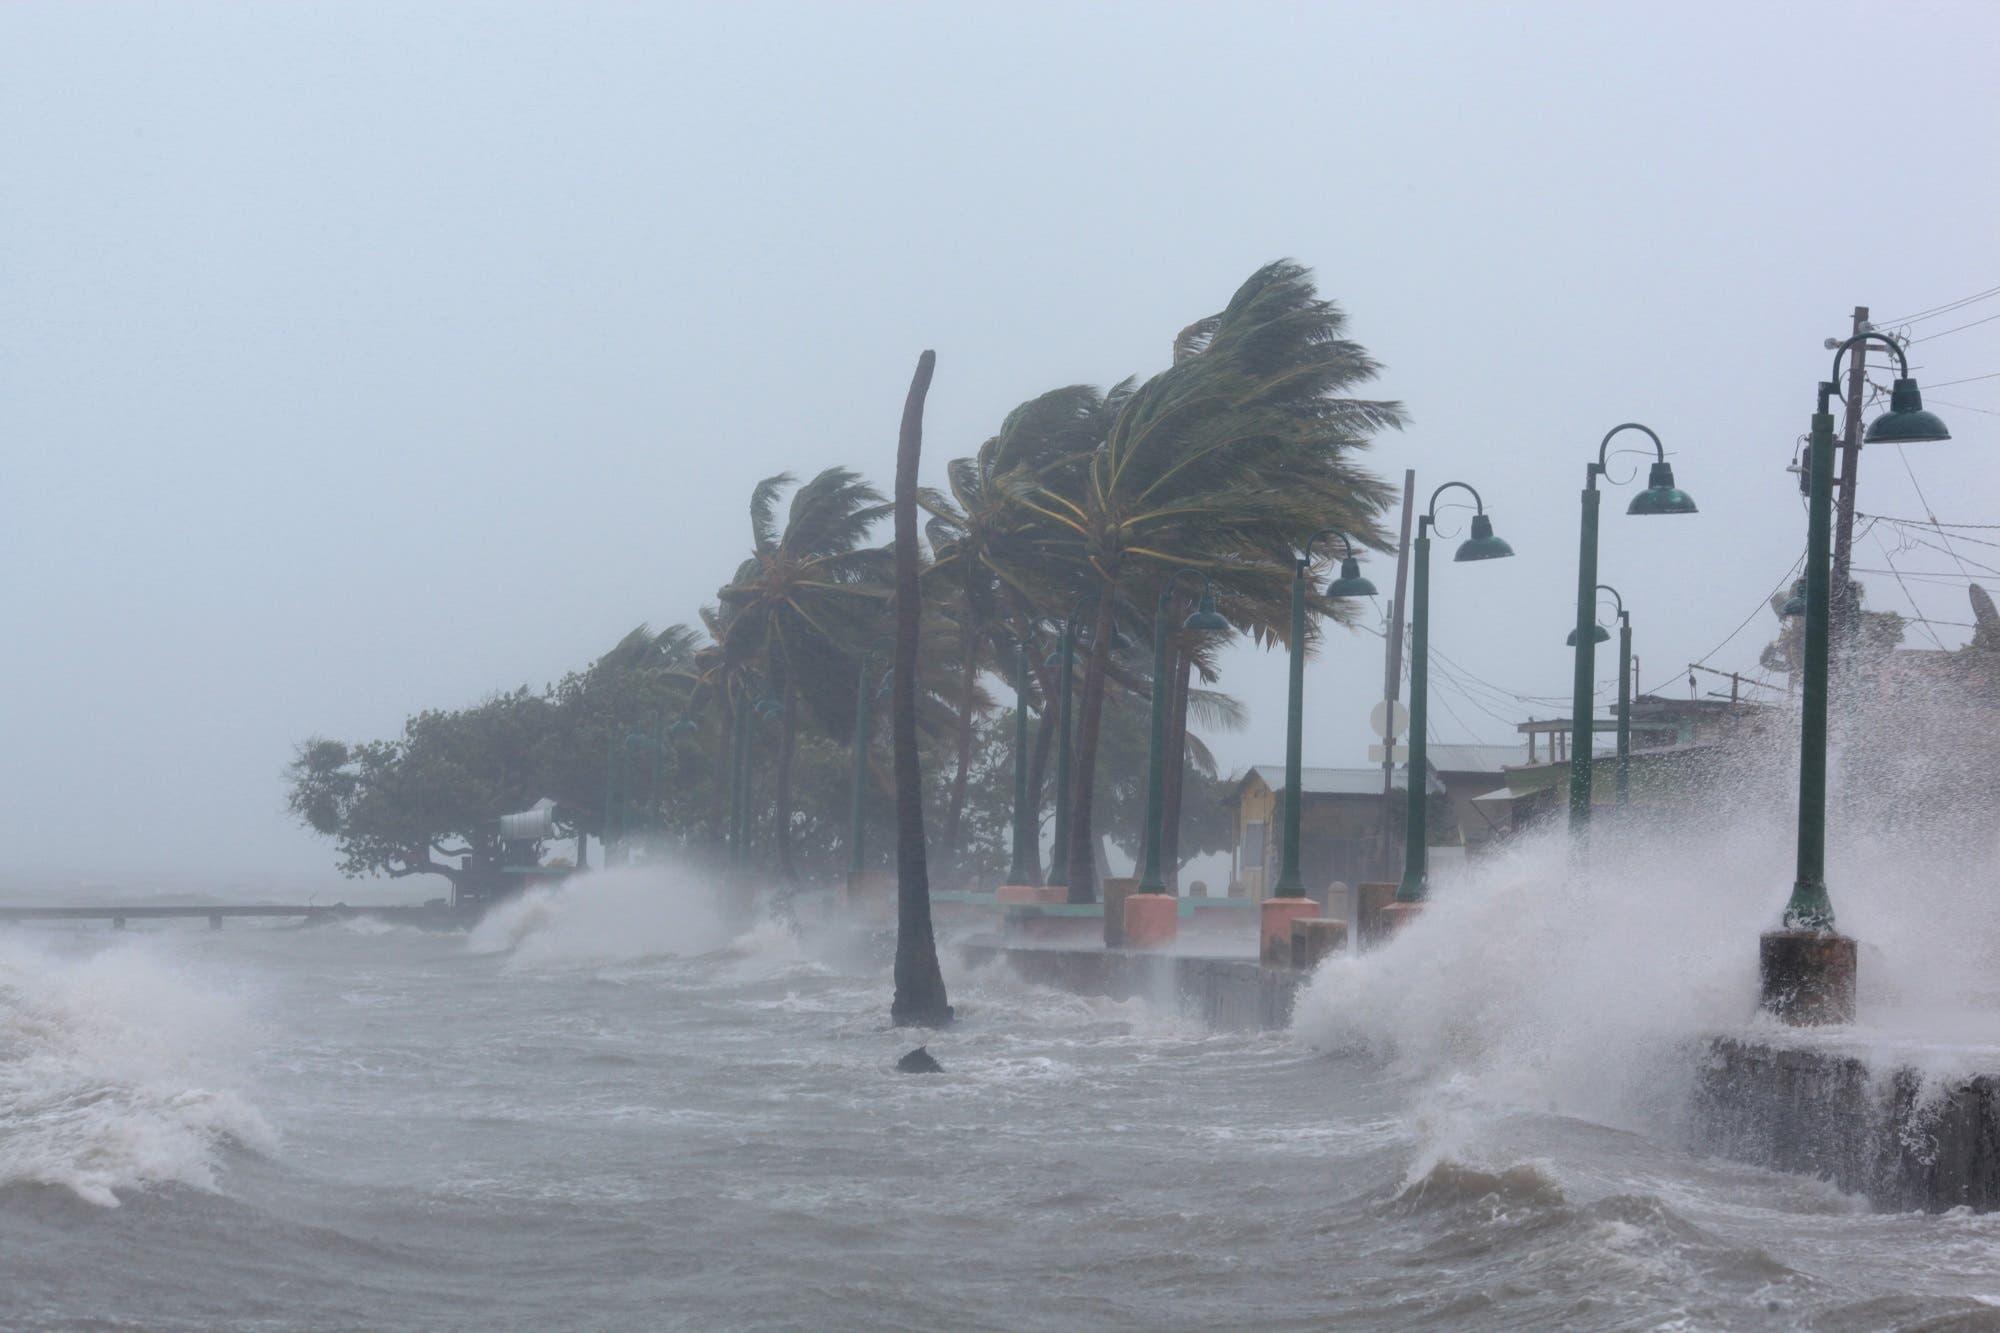 Waves crash against the seawall as Hurricane Irma slammed across islands in the northern Caribbean on Wednesday, in Fajardo, Puerto Rico, September 6, 2017. (Reuters)